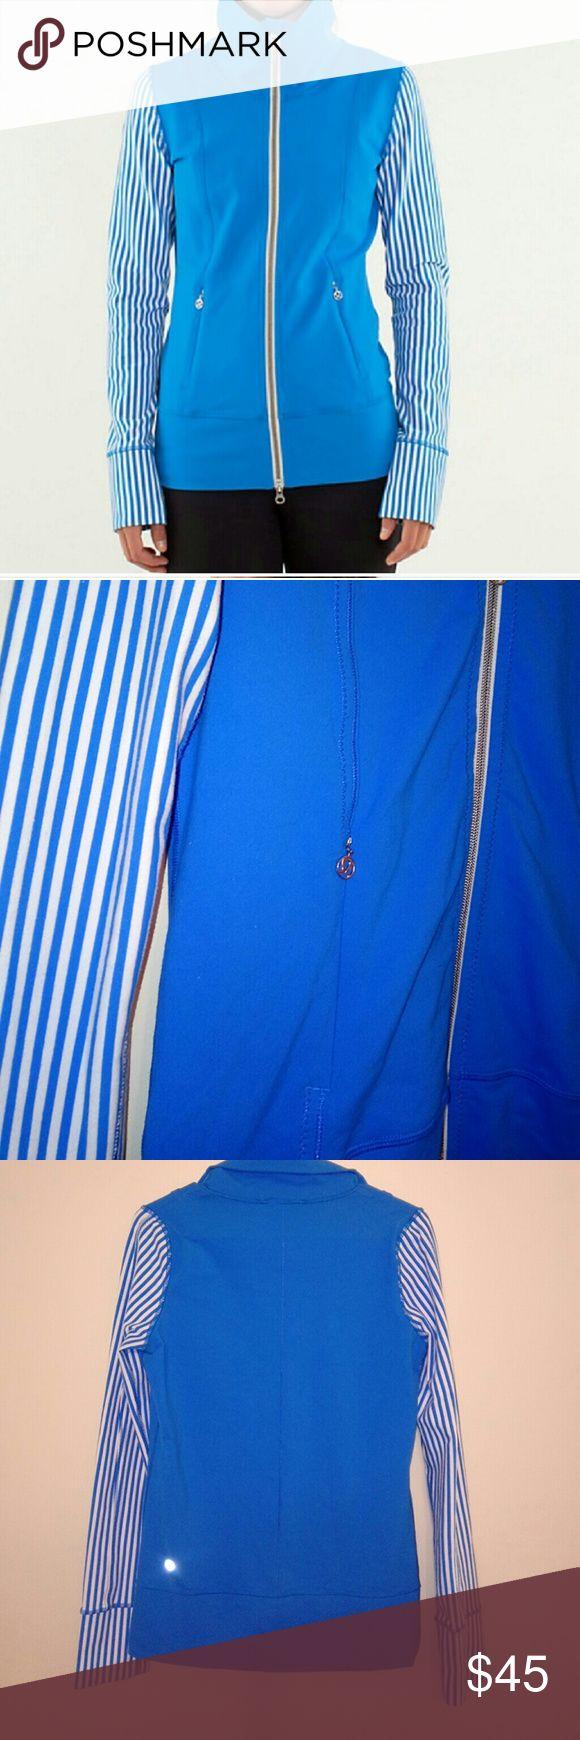 Lululemon Athletica Zip Up. Women's Lululemon Athletica Zip up, size 6 (medium) blue and white.   ??No Trades! ??Make an offer! lululemon athletica Tops